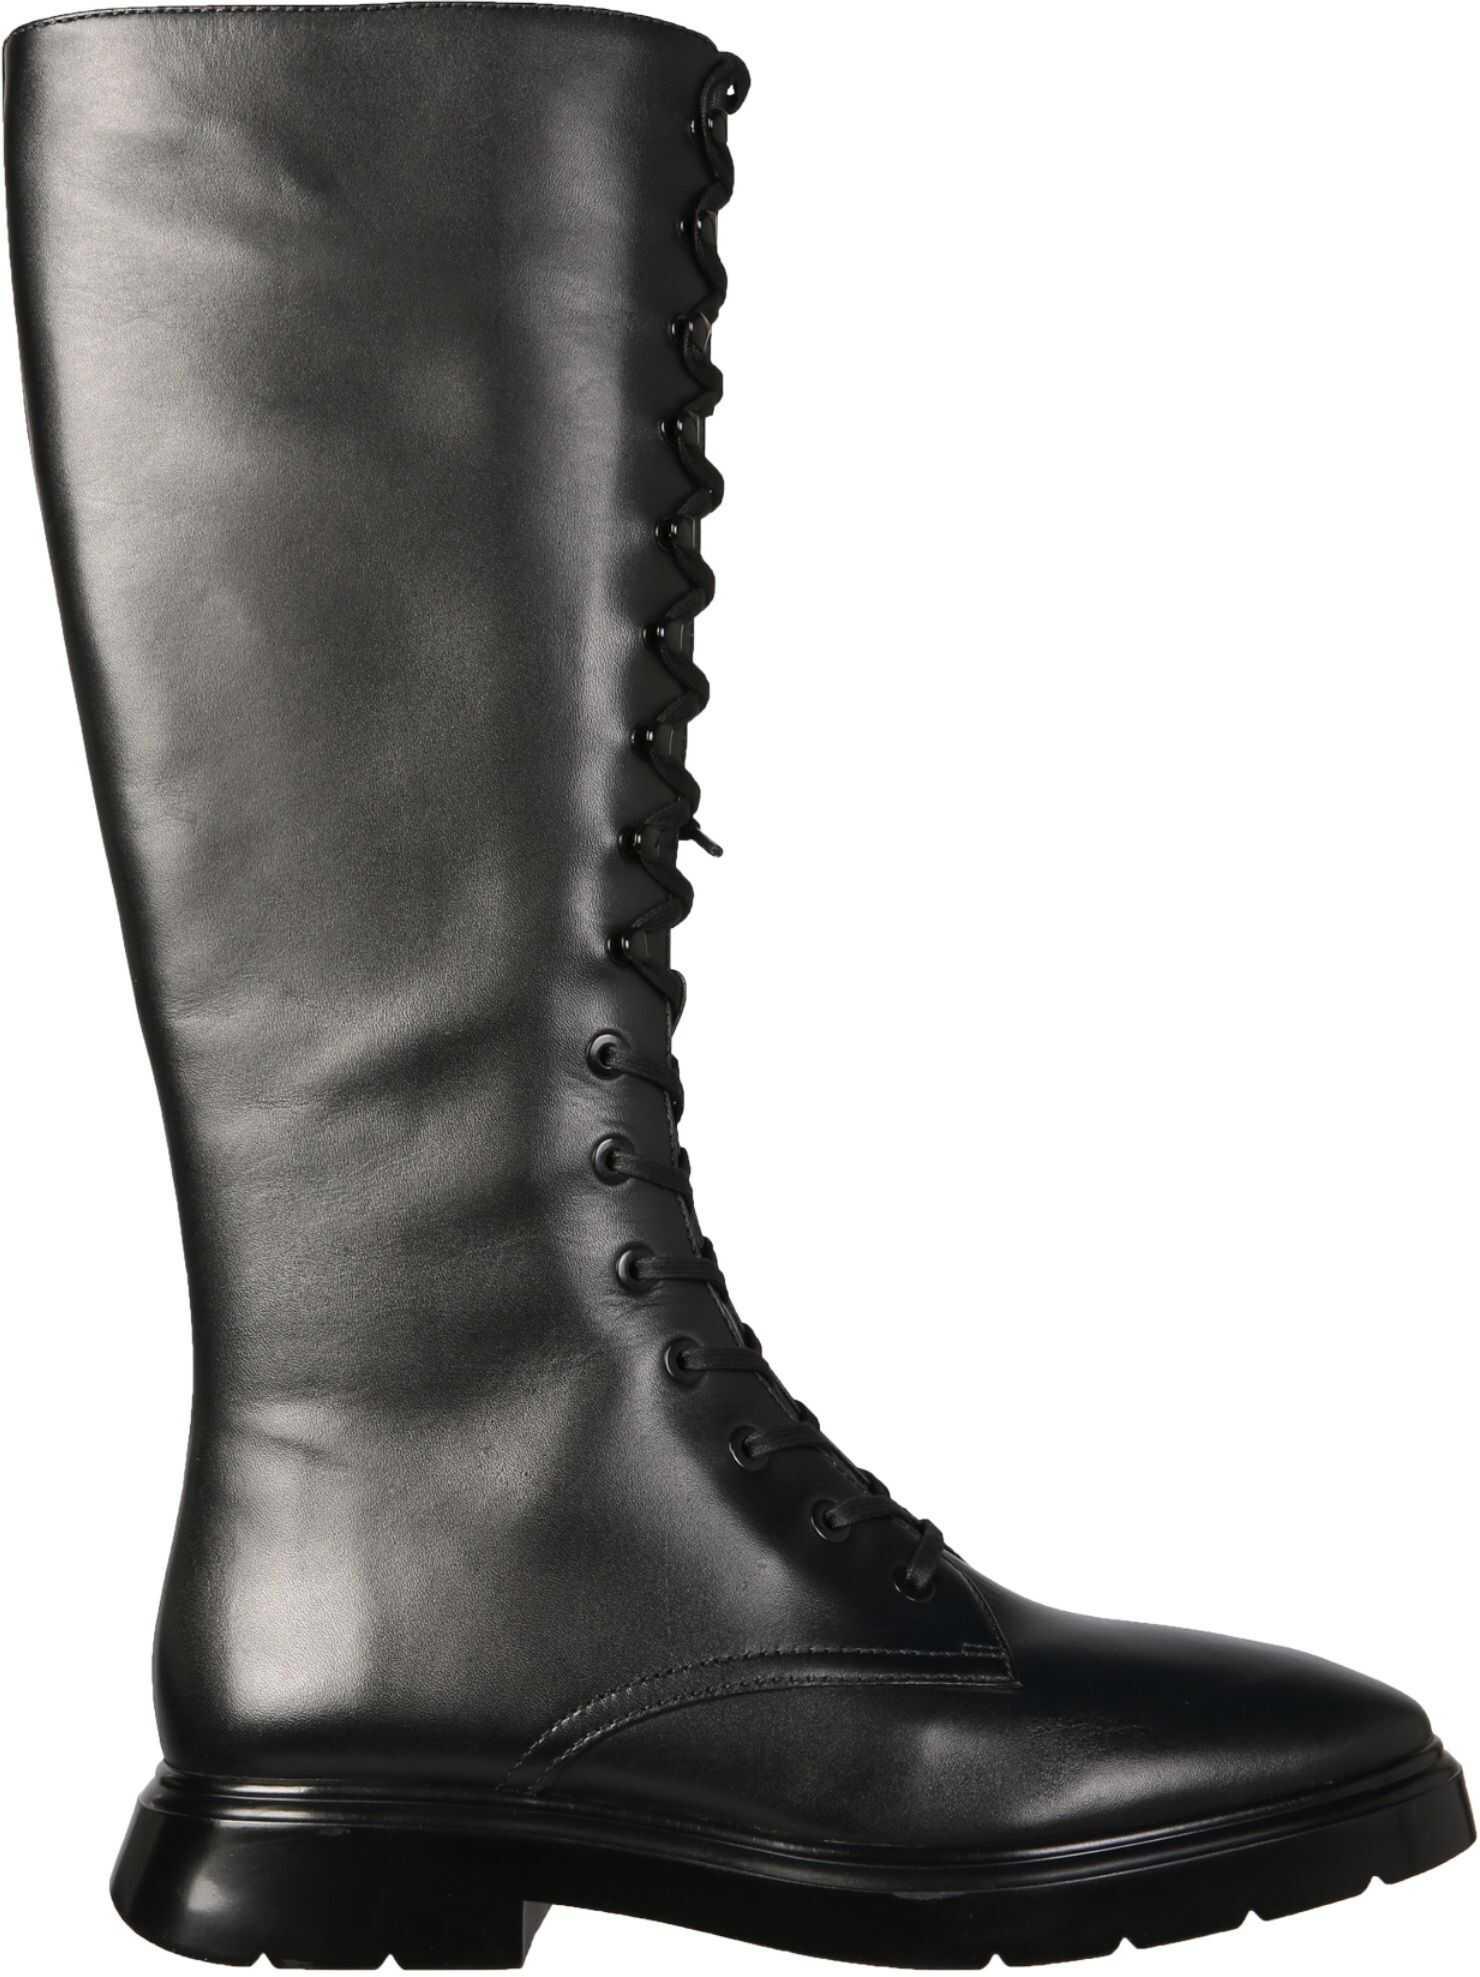 Stuart Weitzman Mckenzie Boot MCKENZIE_SMOBLK BLACK imagine b-mall.ro